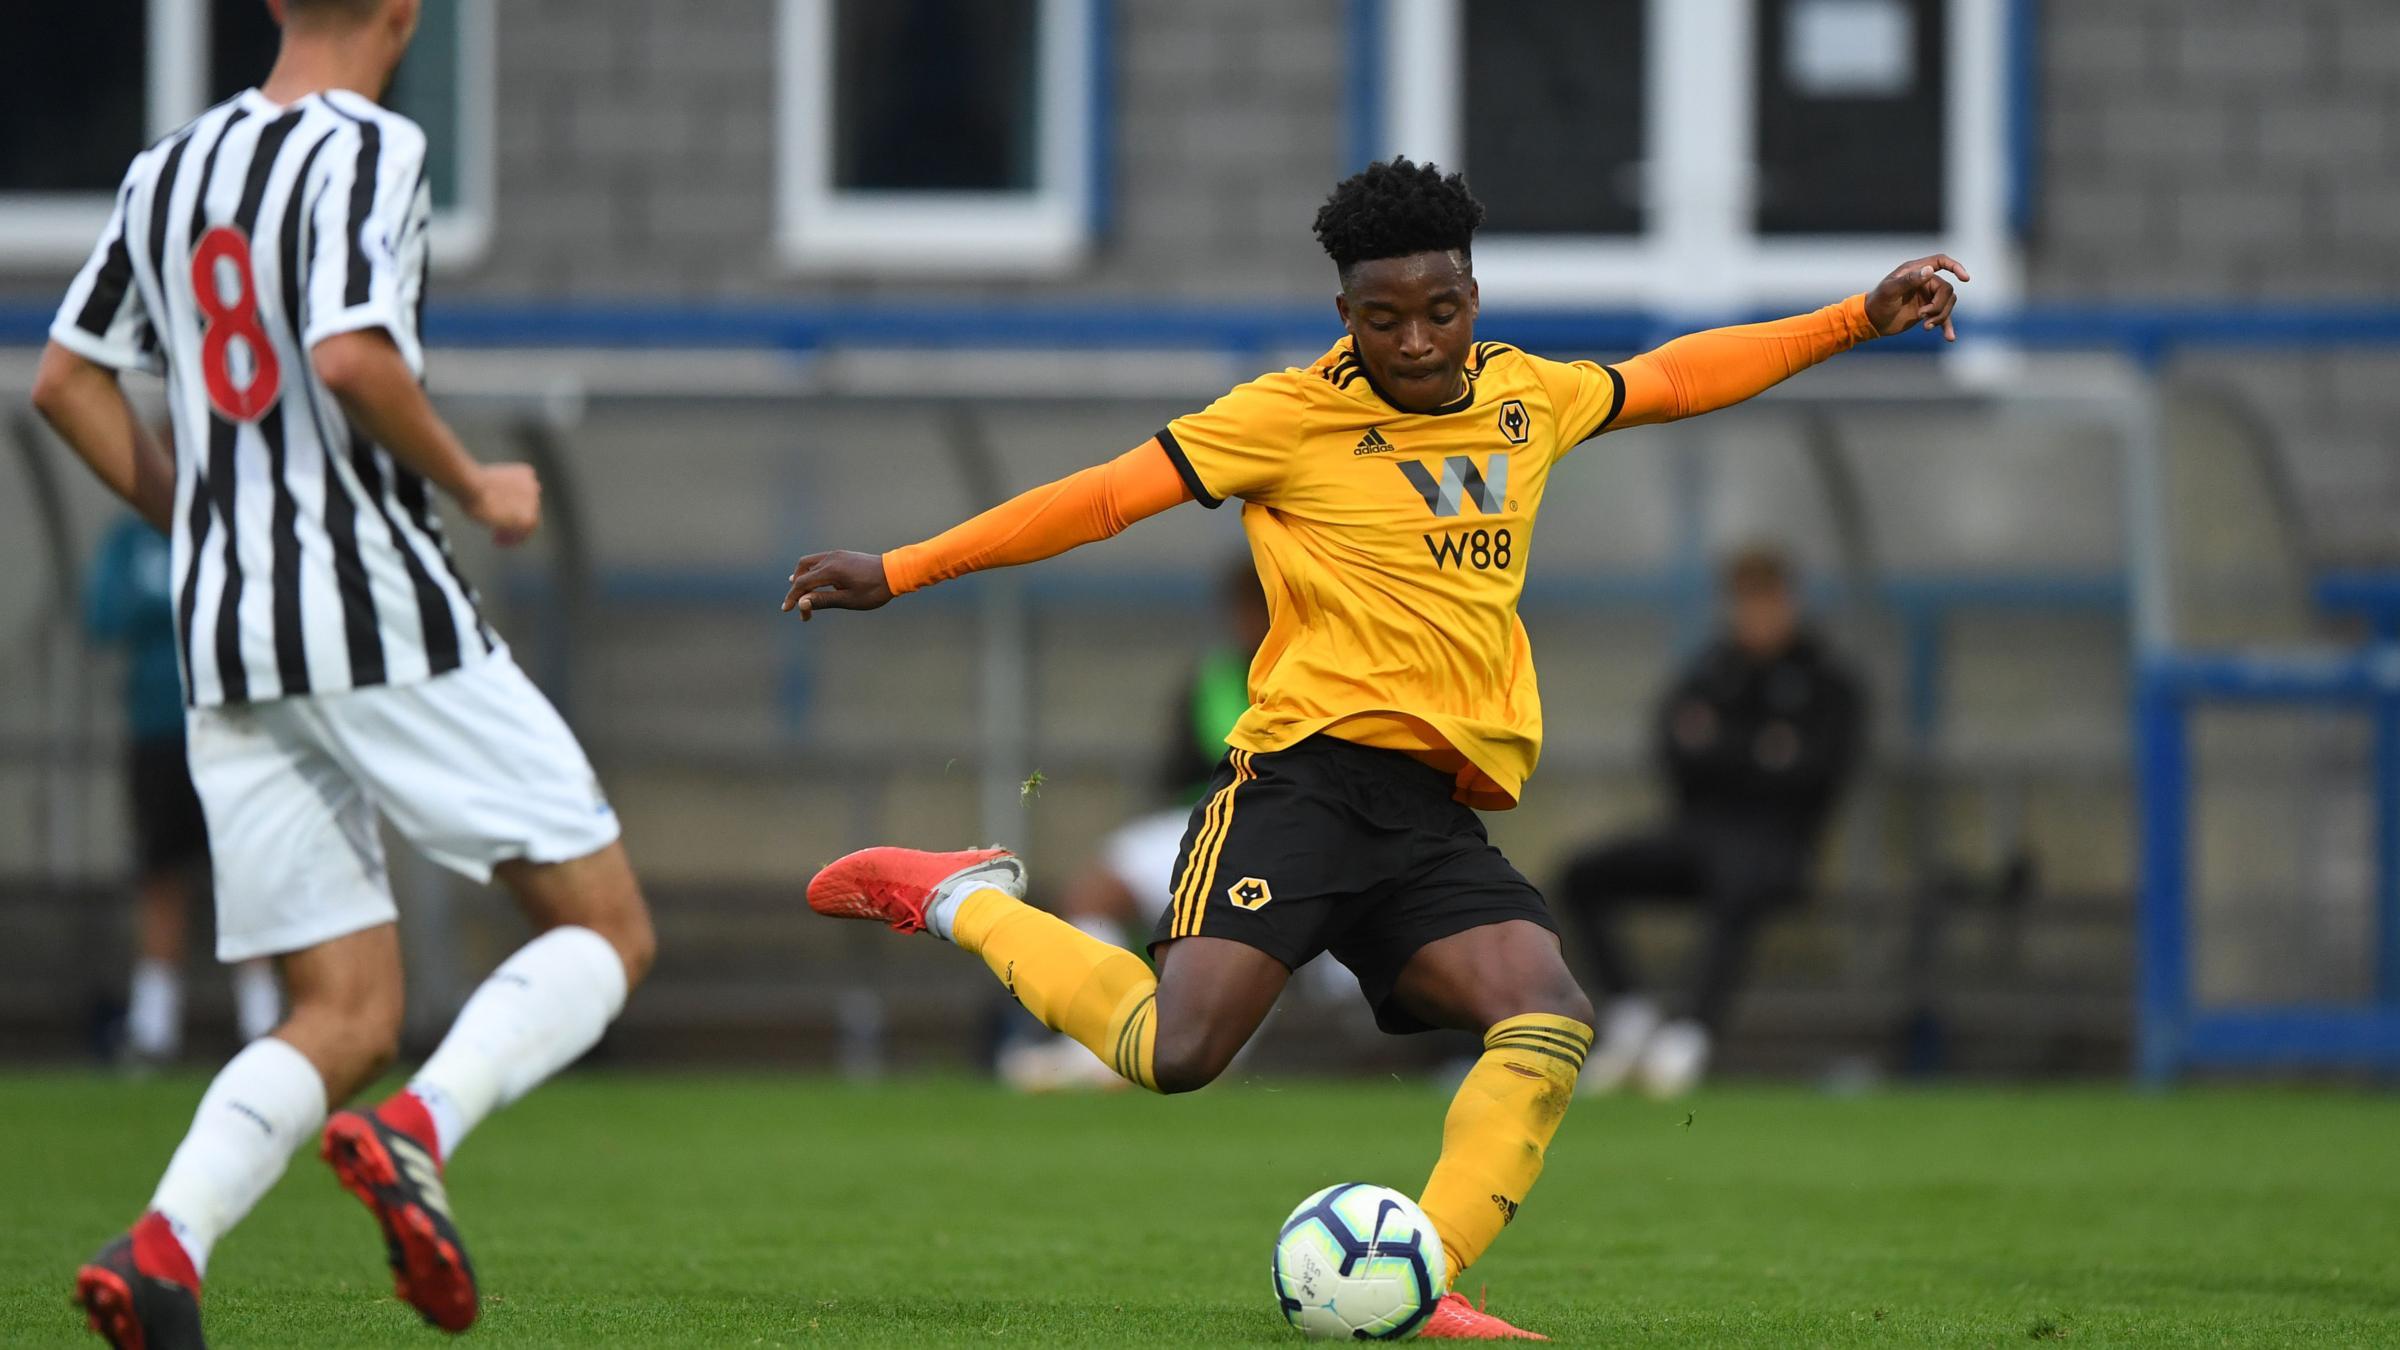 Wolves Vs Newcastle: Under-23s' Match Against Newcastle Postponed